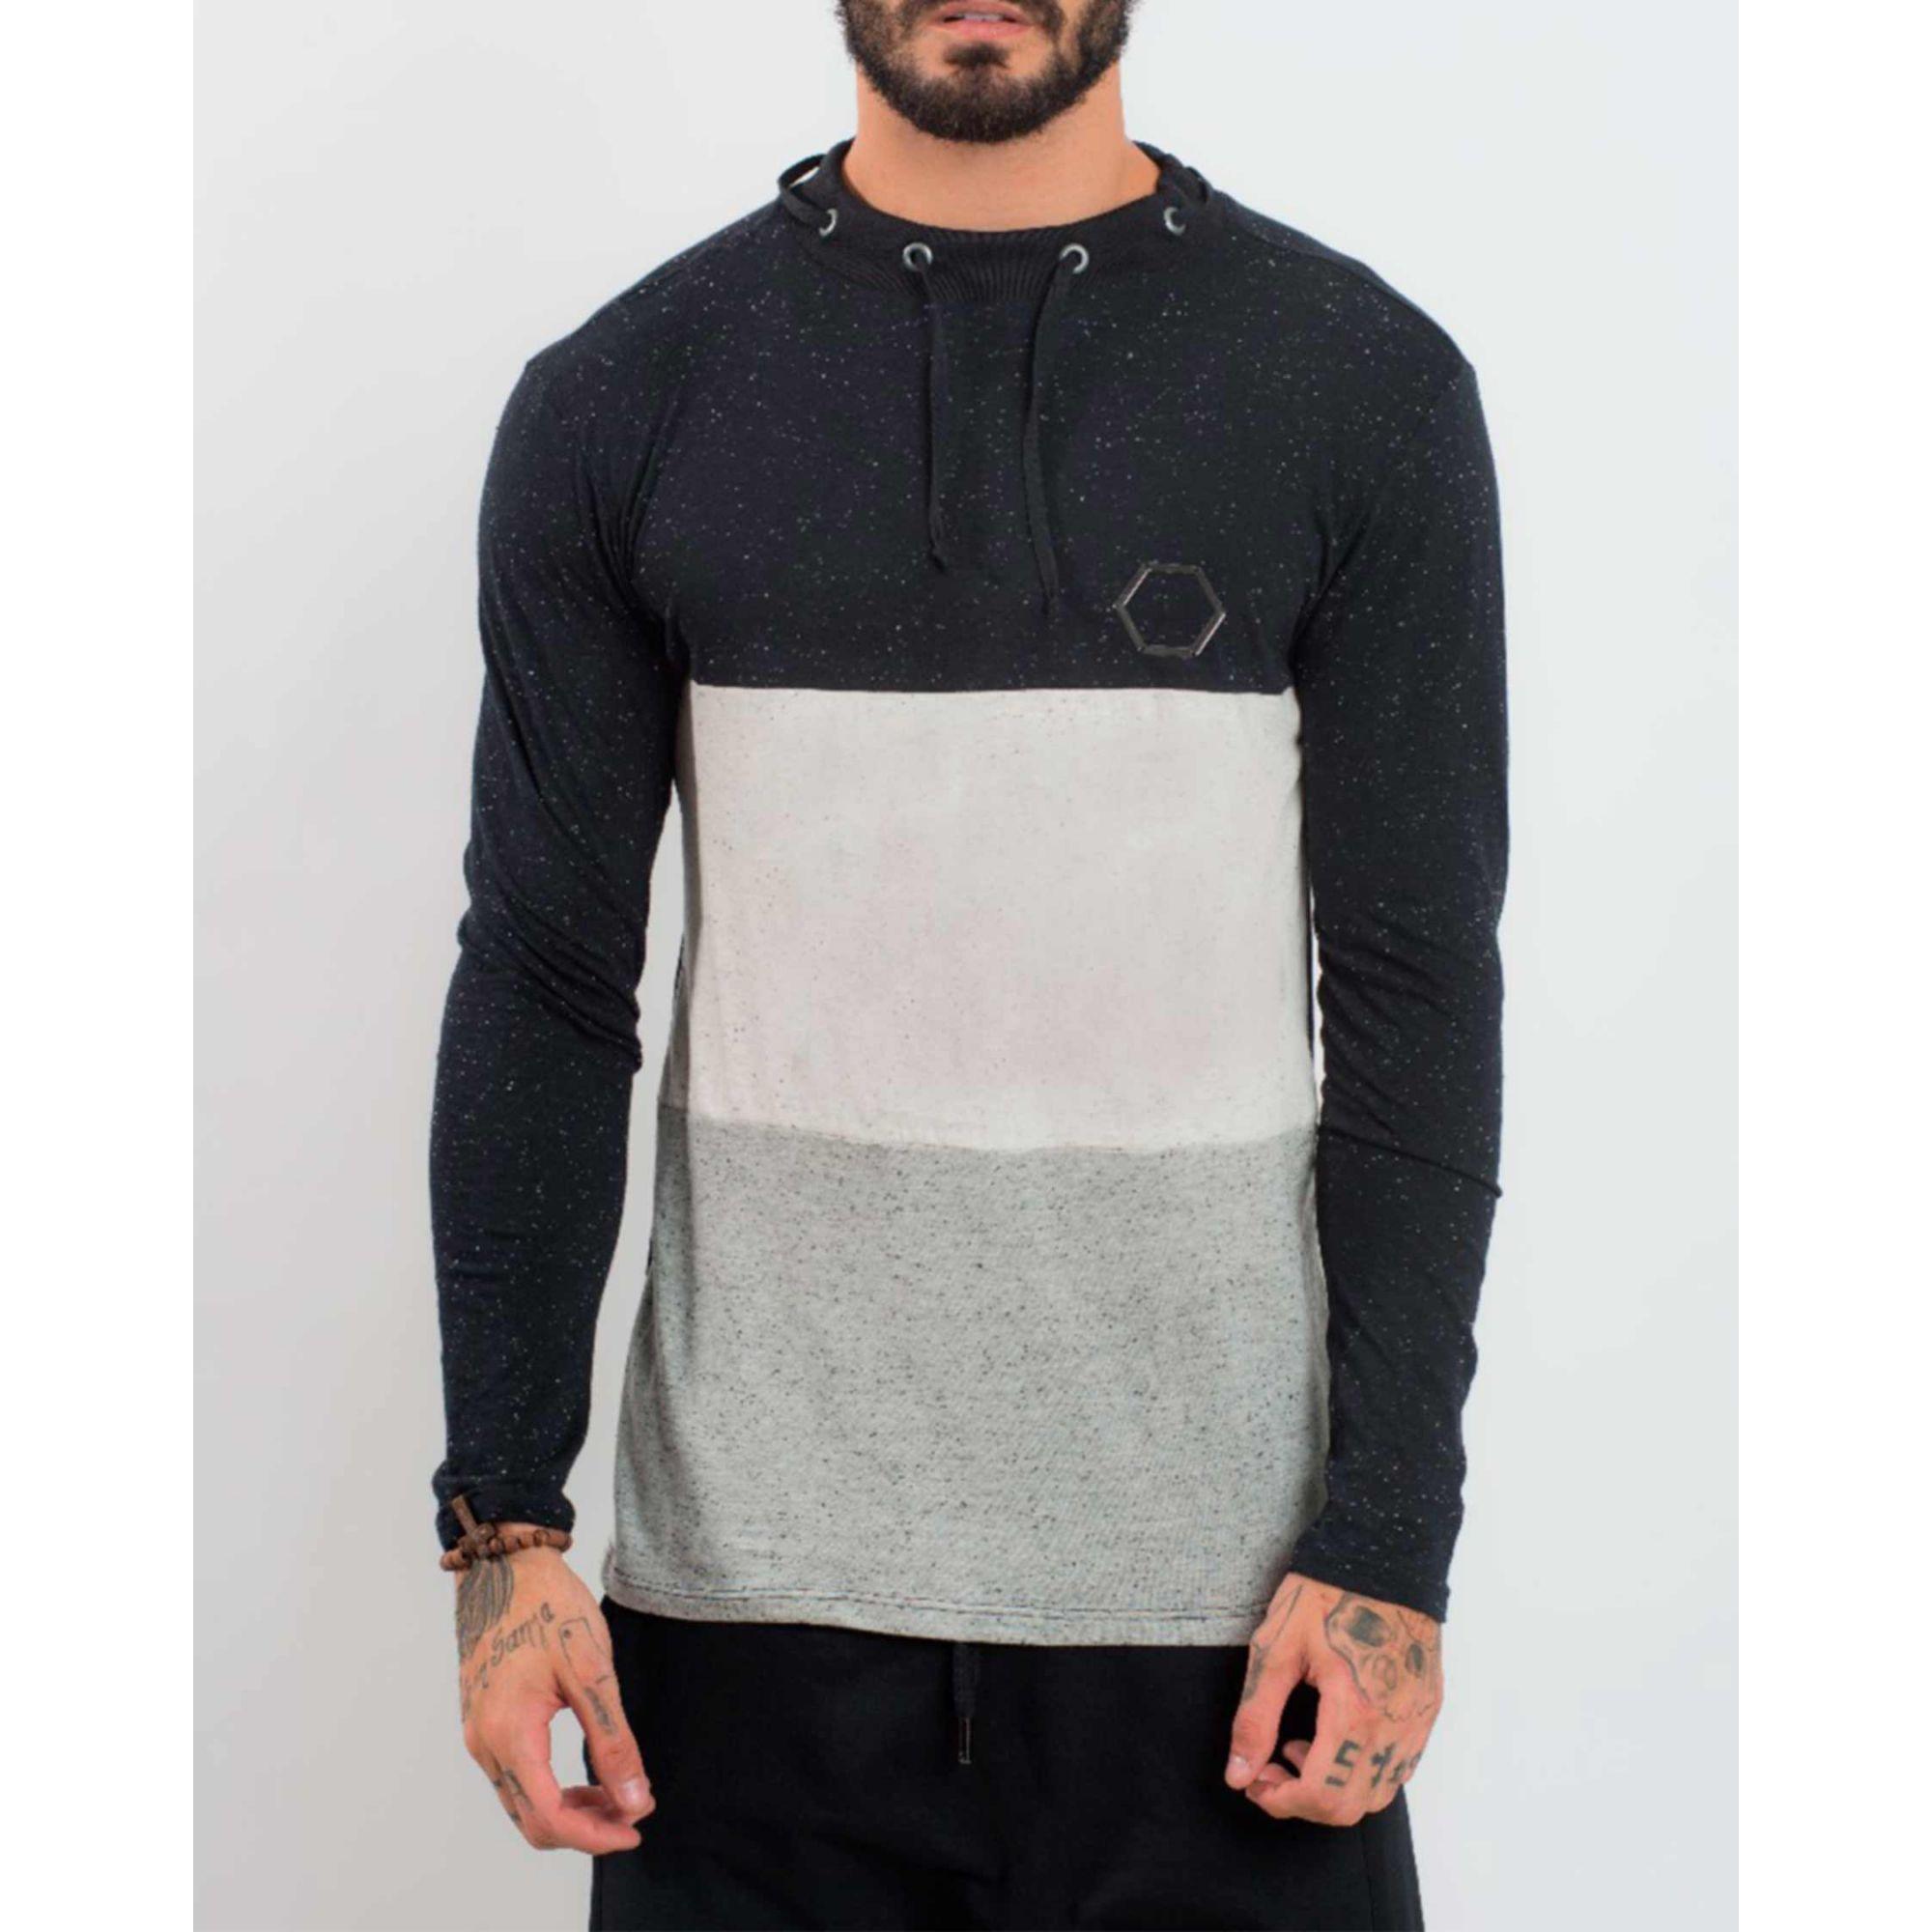 Camiseta Buh Manga Longa Stripes Lace